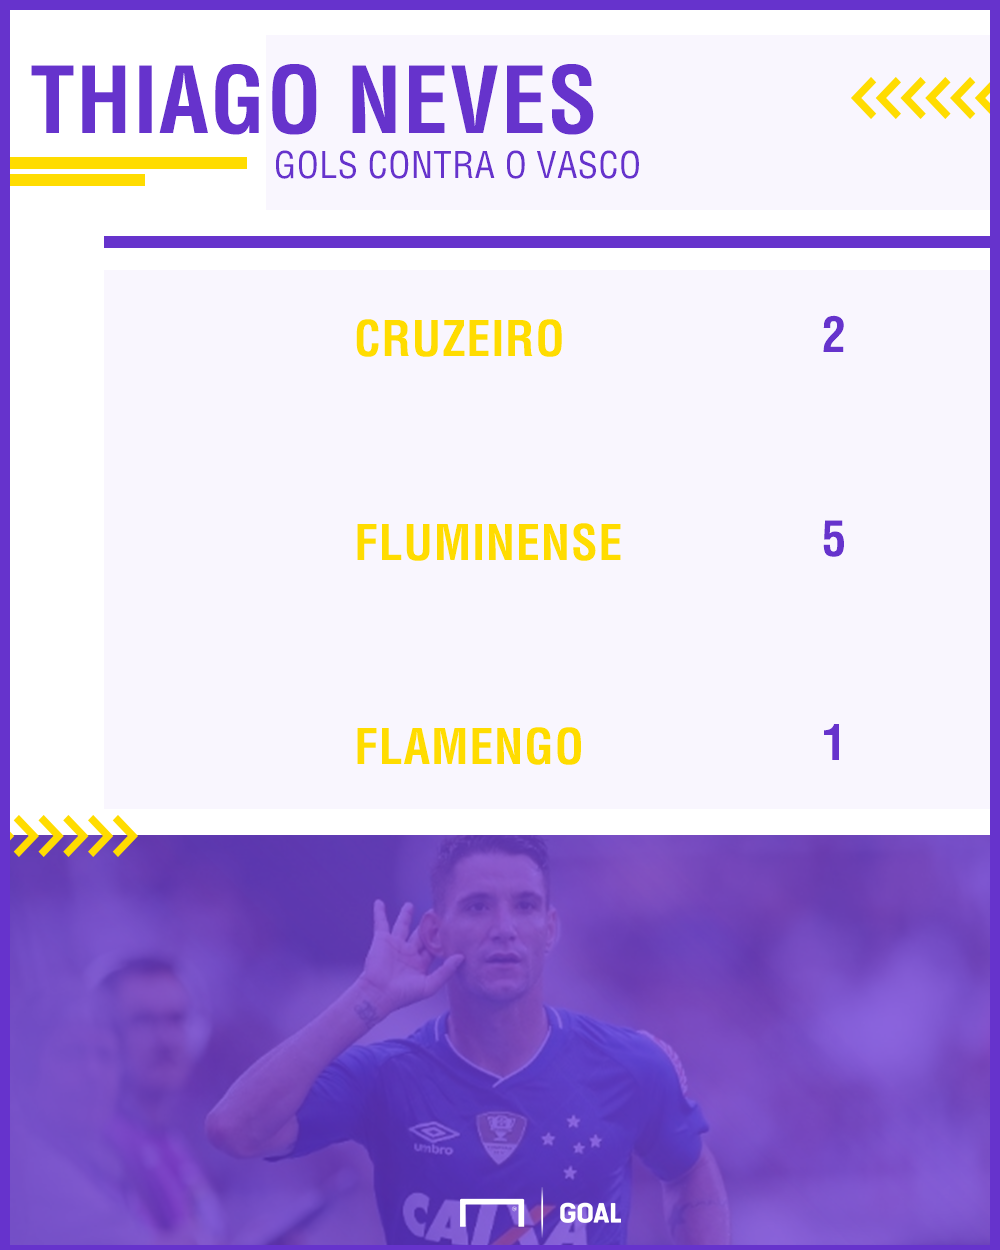 Thiago Neves GFX